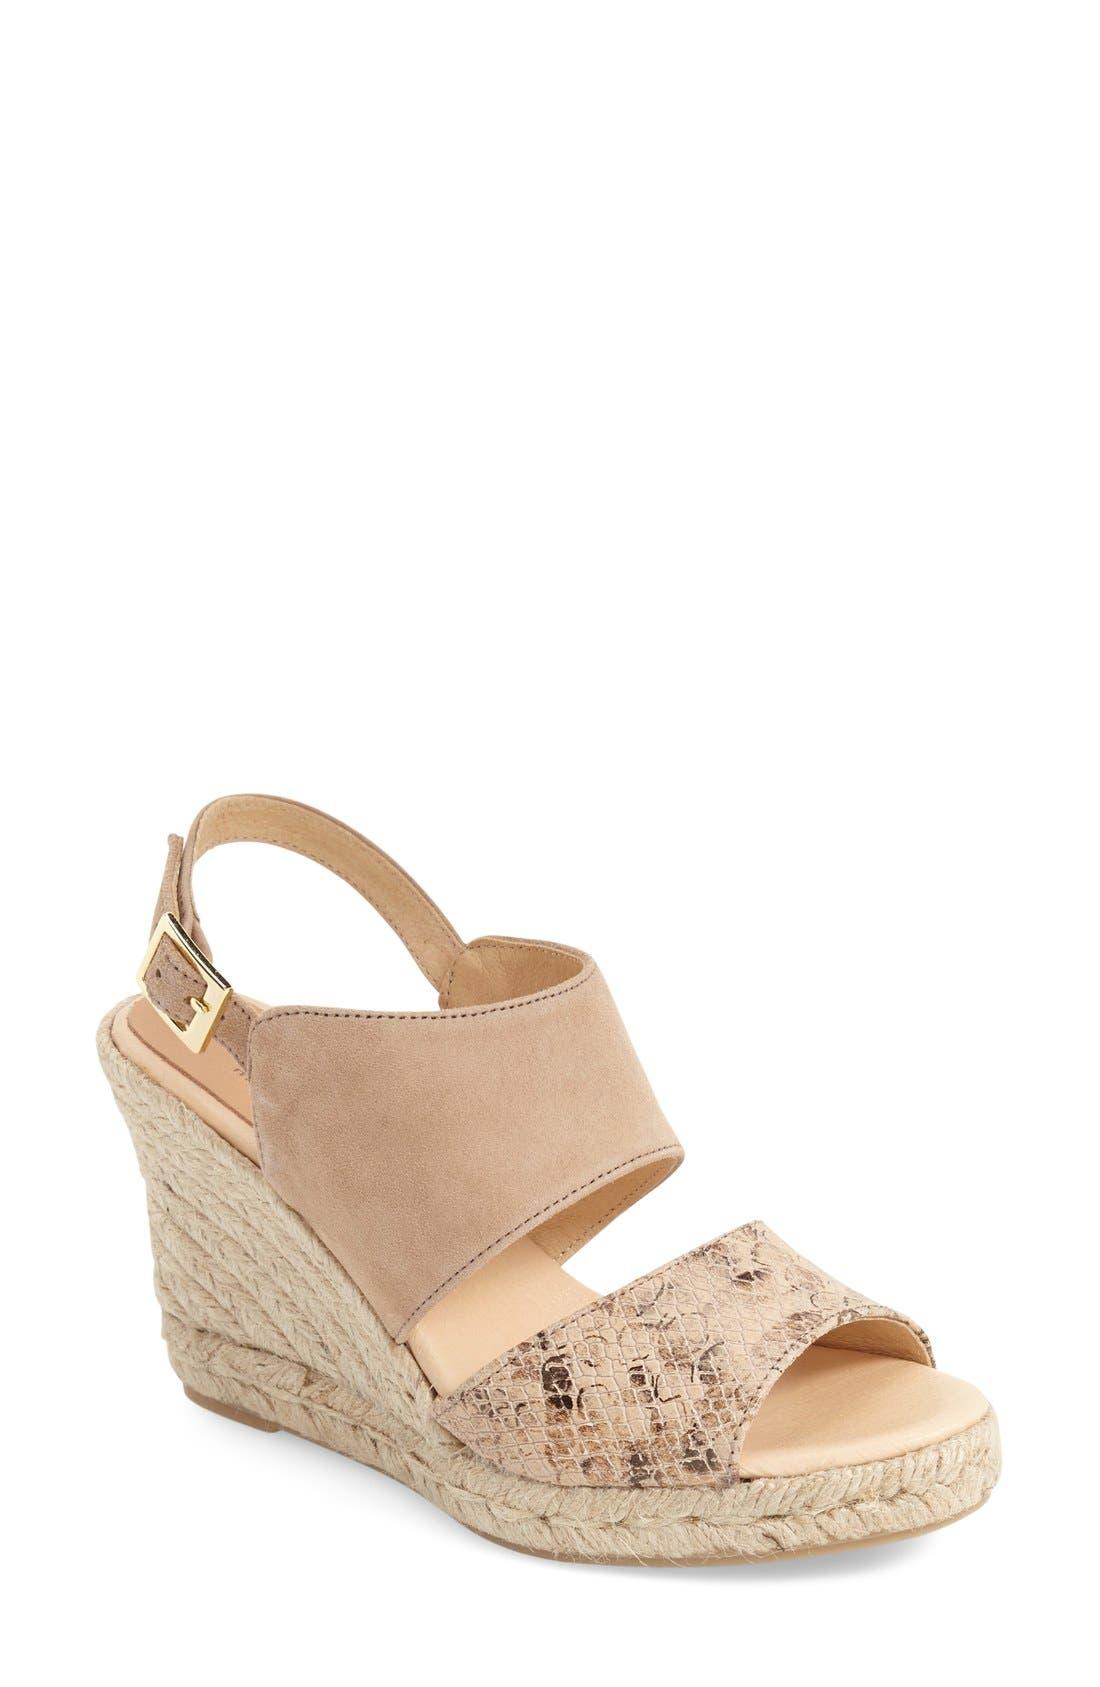 Main Image - patricia green 'Elise' Wedge Sandal (Women)